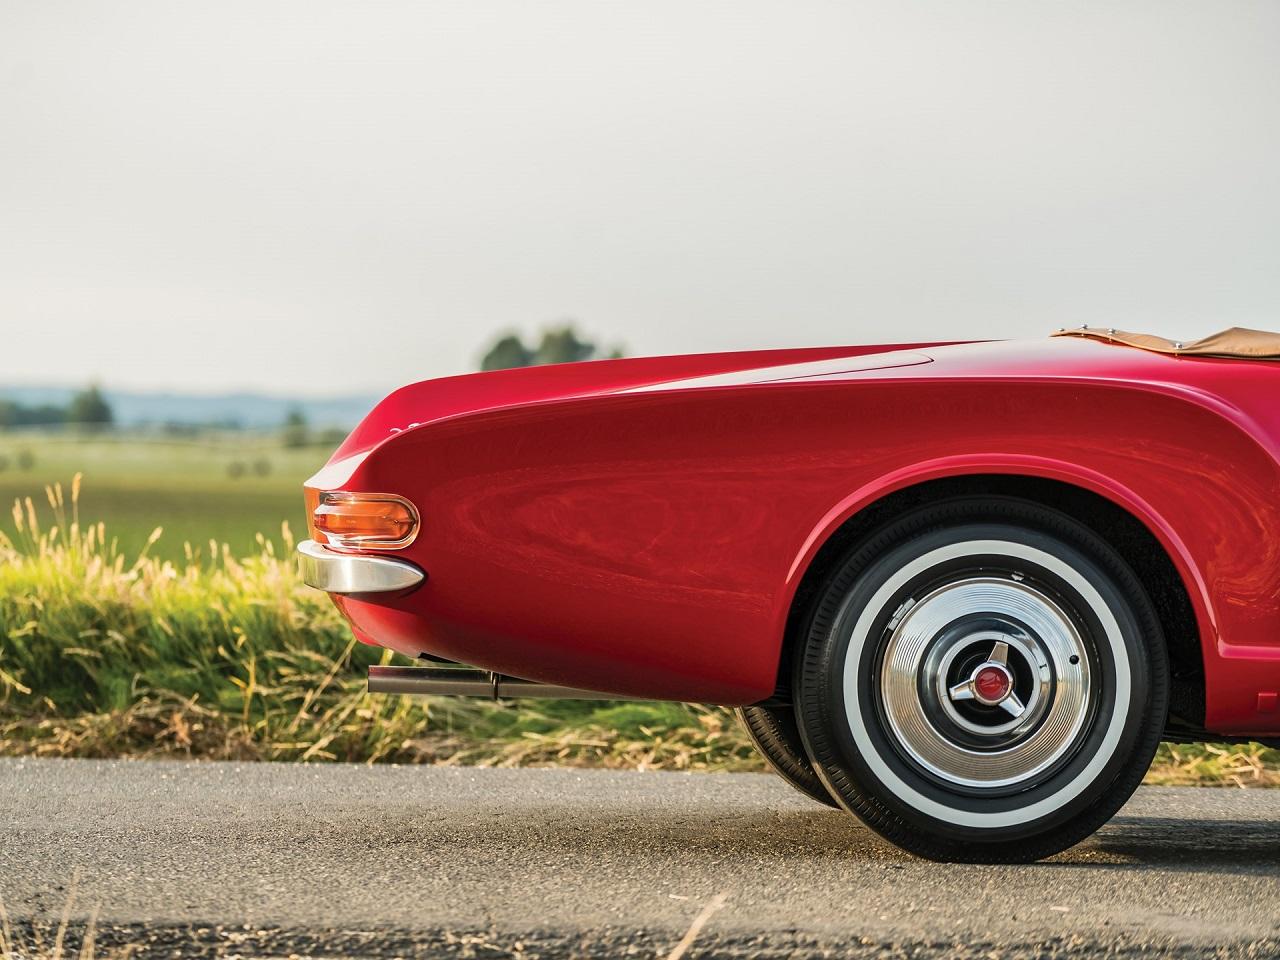 '61 Plymouth Asimmetrica Roadster Ghia - Vous avez dit bizarre ? 3